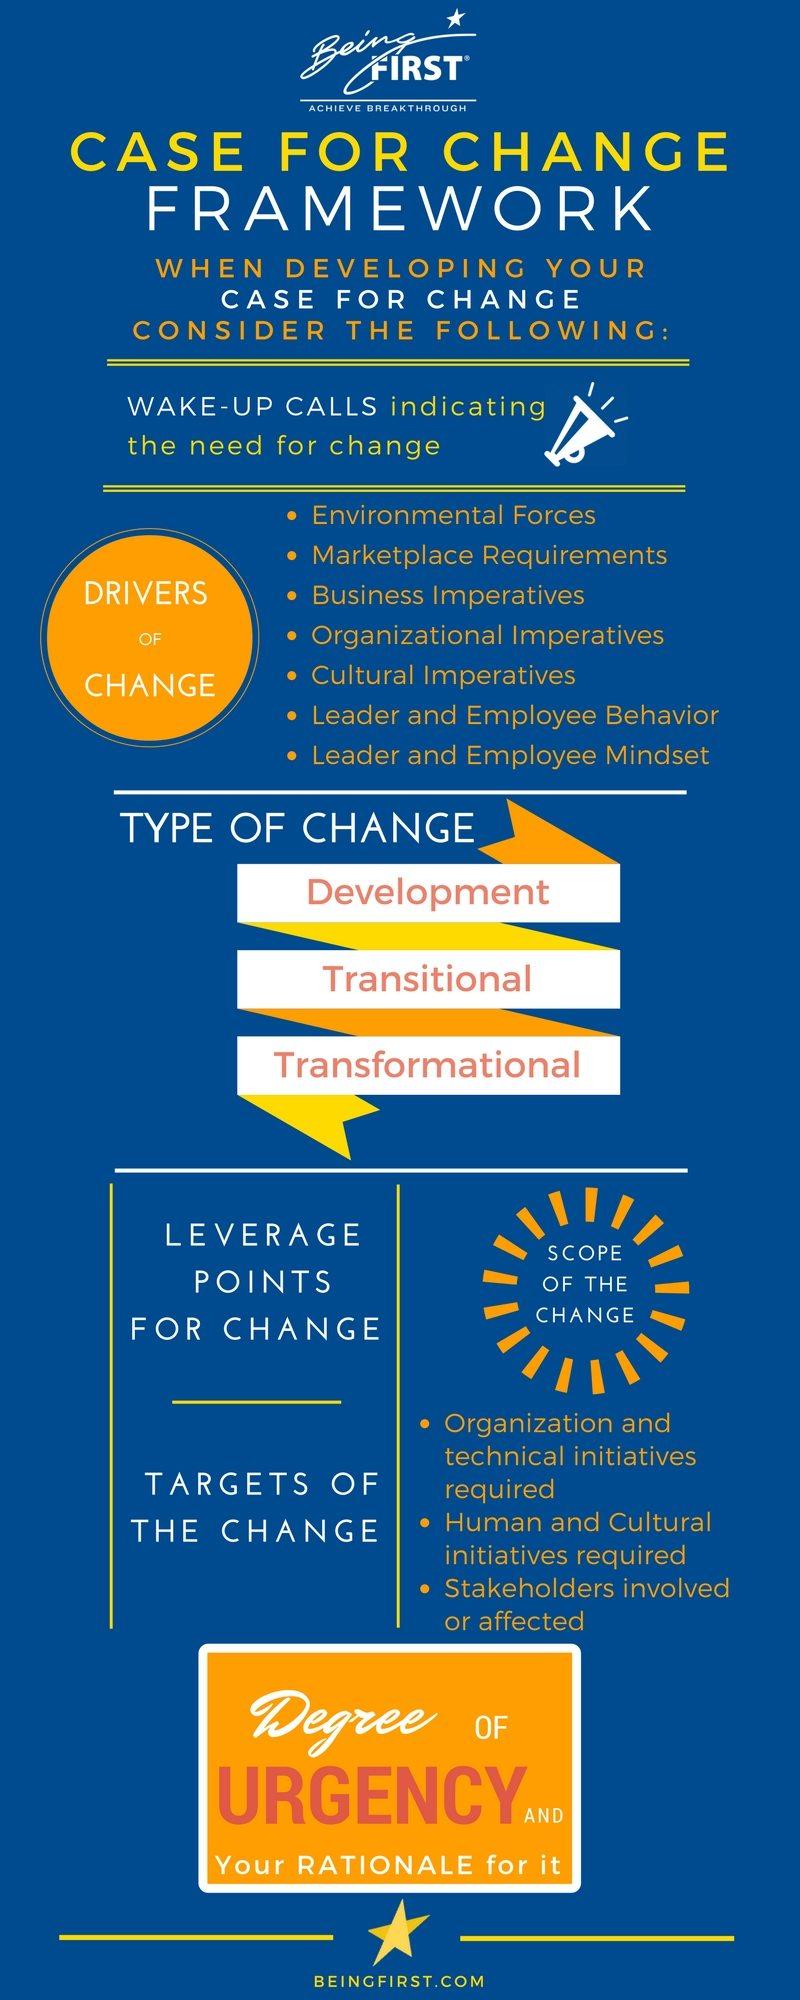 InfoGraphic_Case-for-Change-Framework_FINAL-1-1.jpg